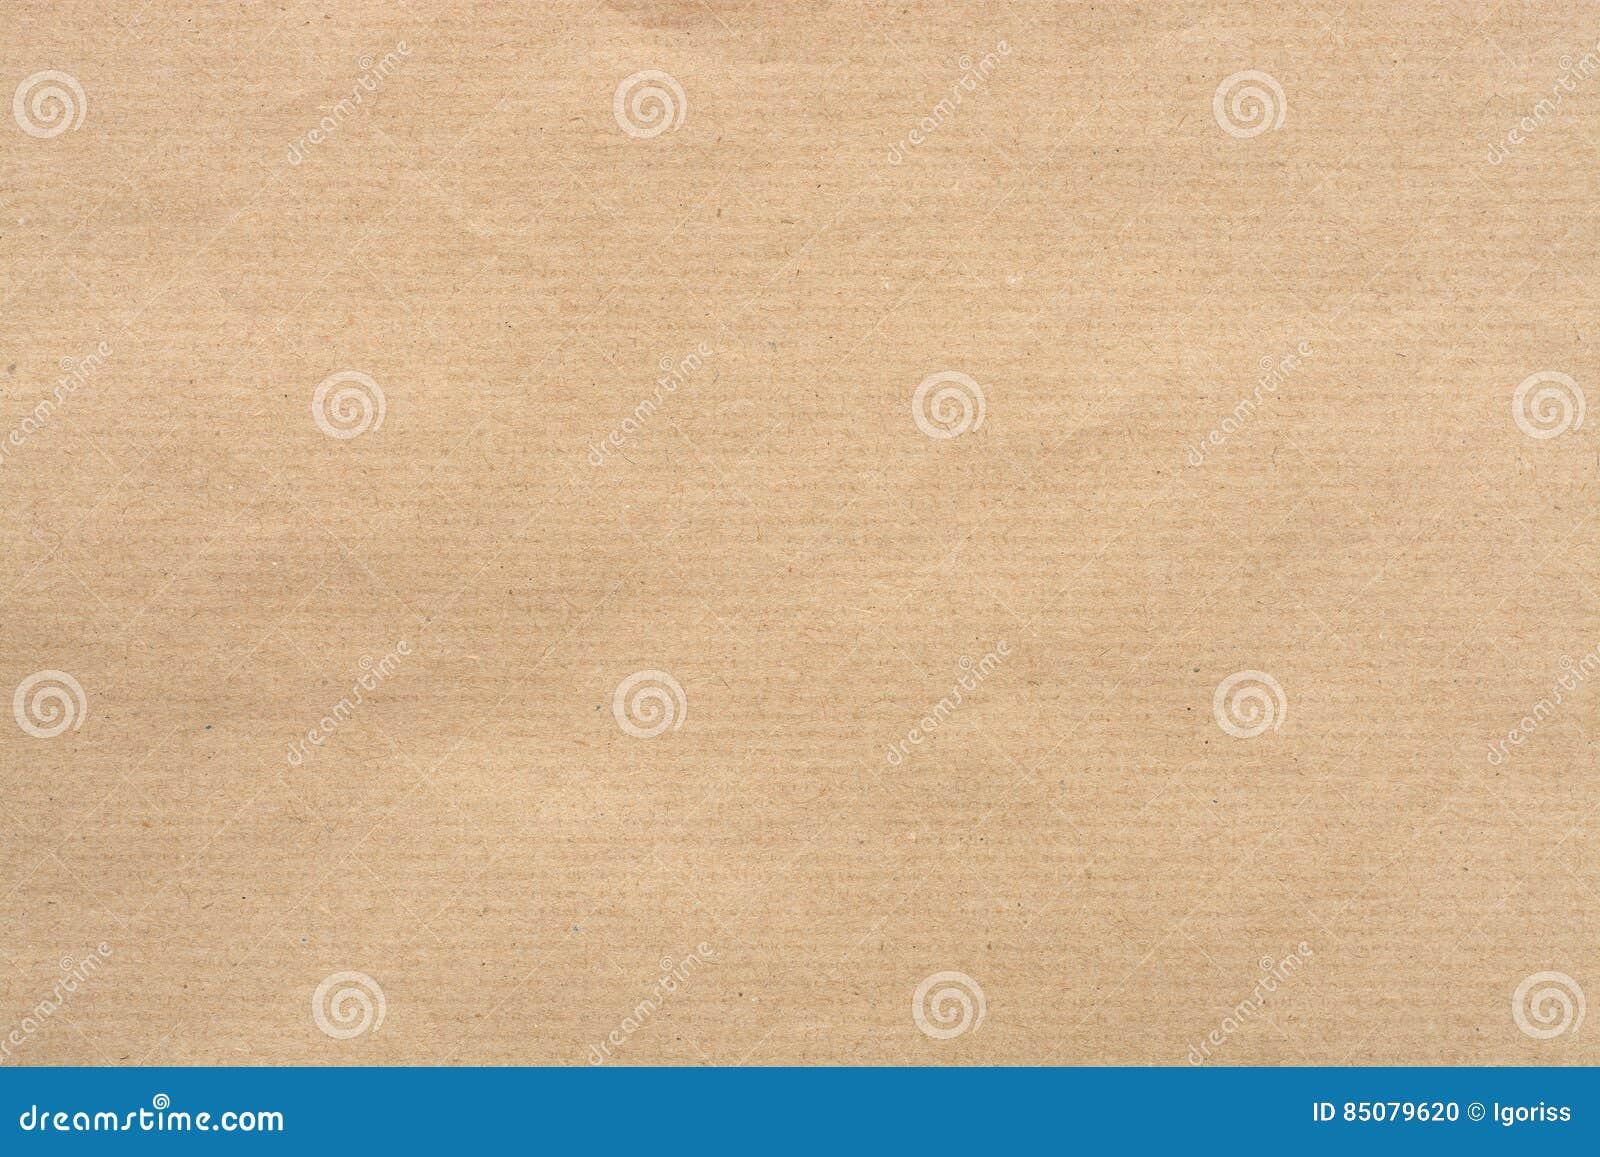 Textura do papel de embalagem